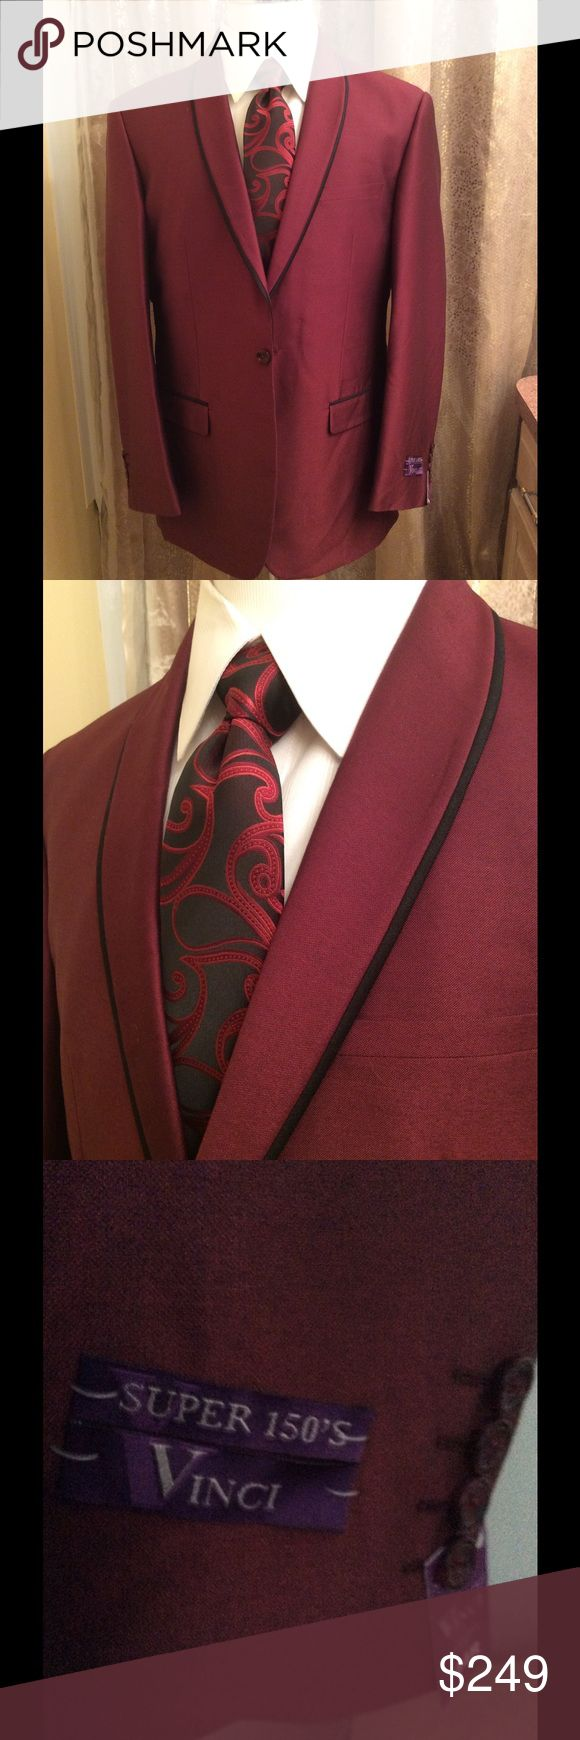 Mens slim fit suit 44r from WJB REGAL COLLECTION Vinci MENS Slim fit suit/ Size 44r/ NWT/ Black lapel piping/ color: burgundy Suits & Blazers Suits